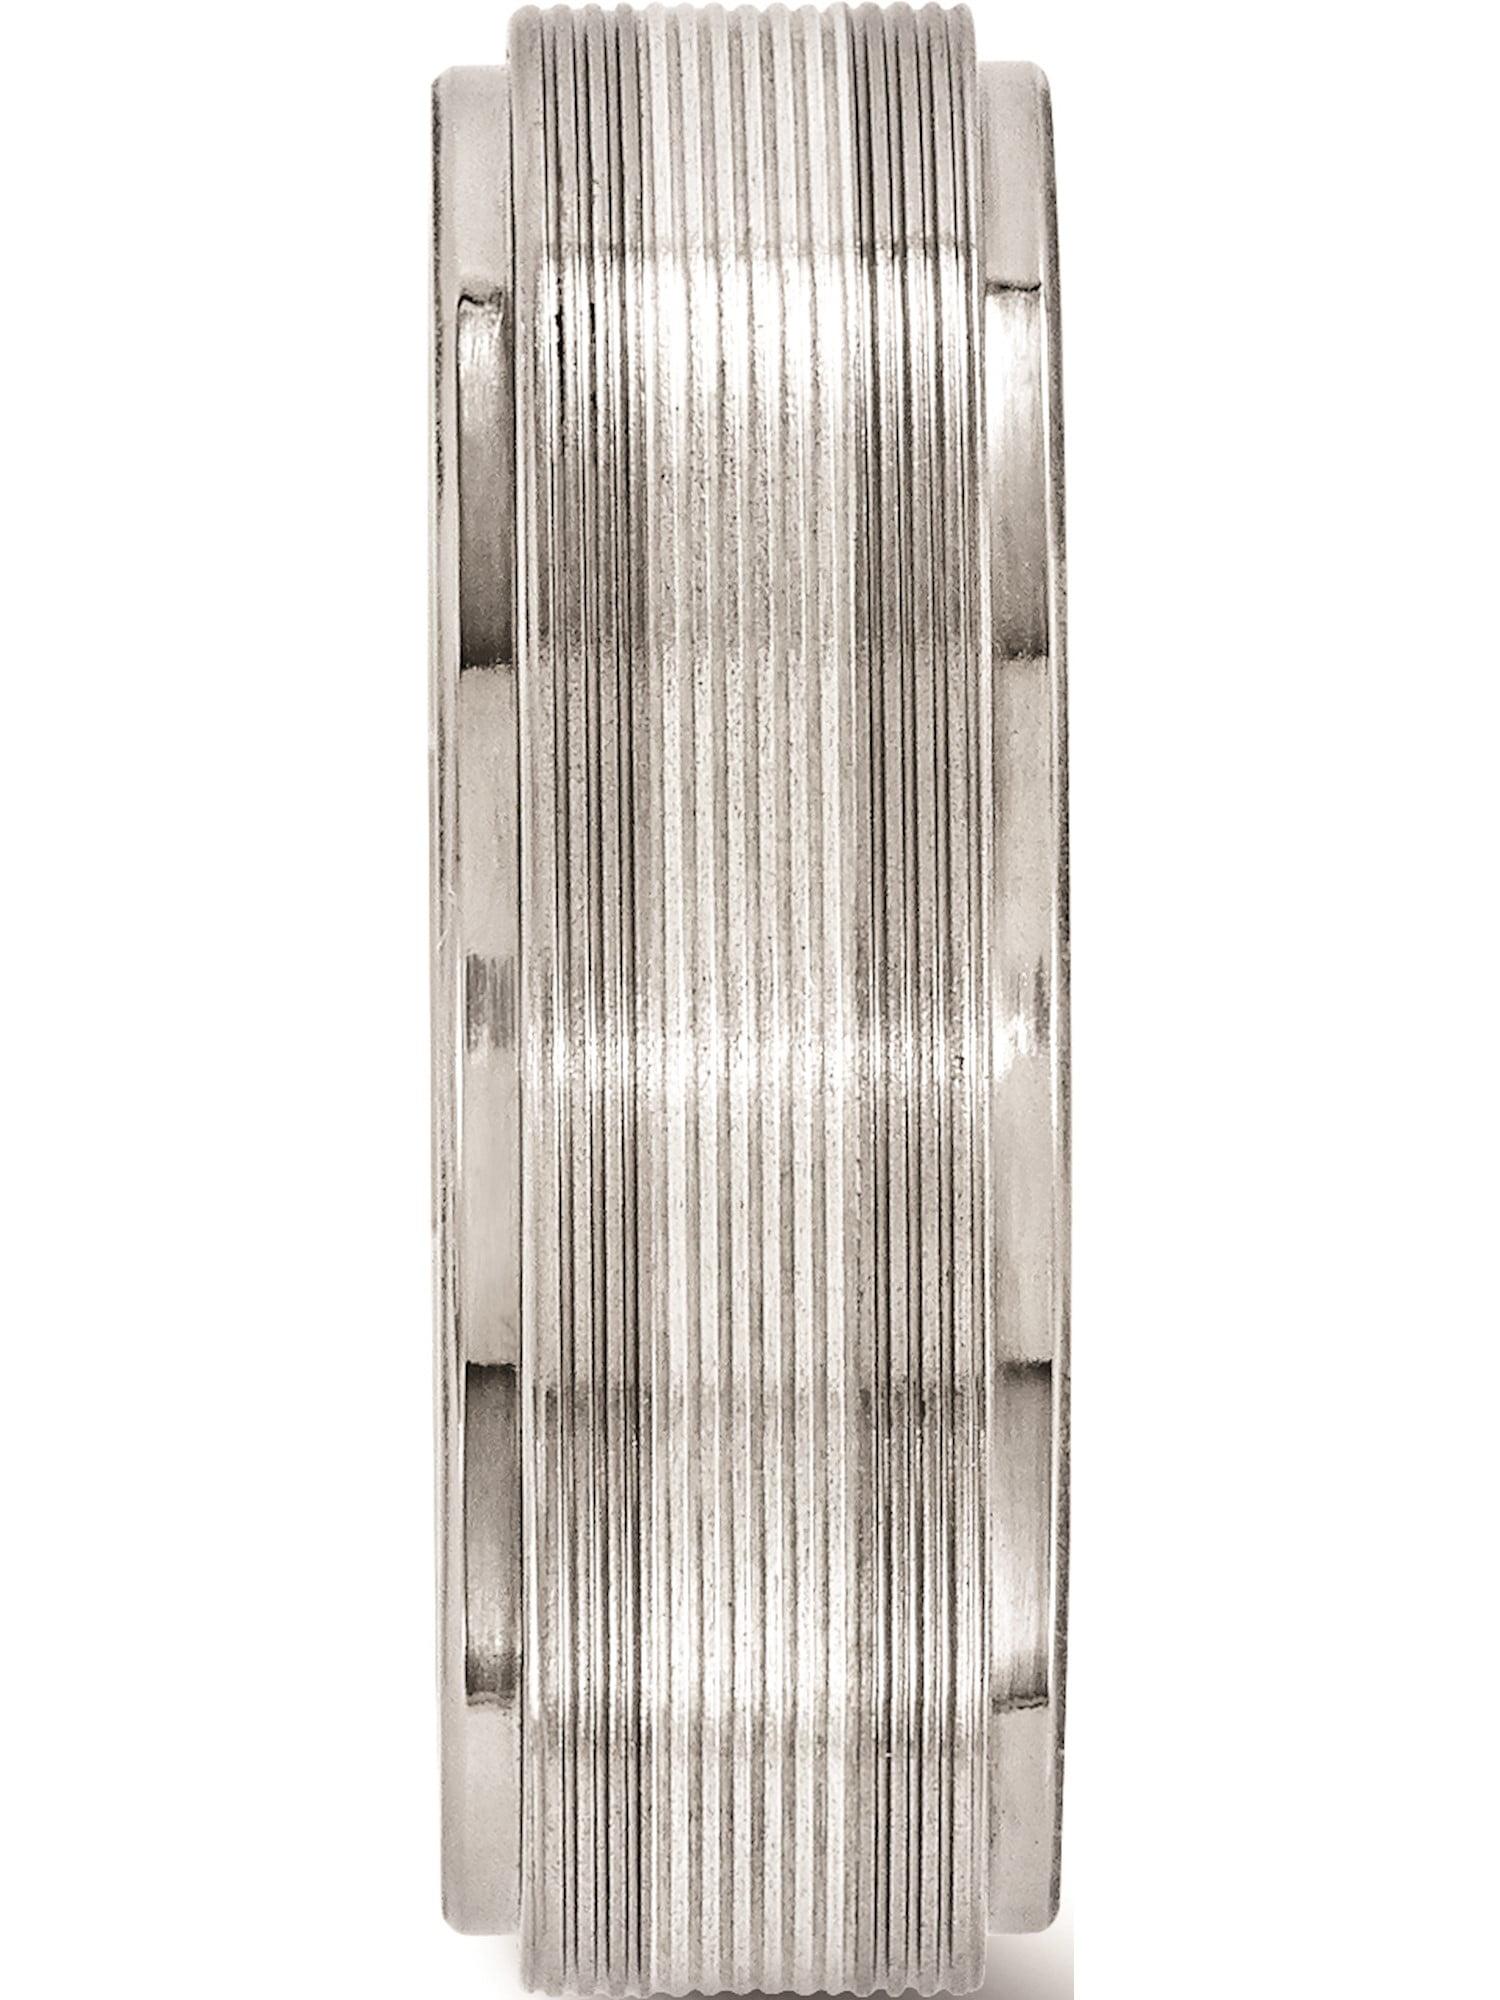 Edward Mirell Titanium w//14k White Gold Textured Lines 7.5mm Band